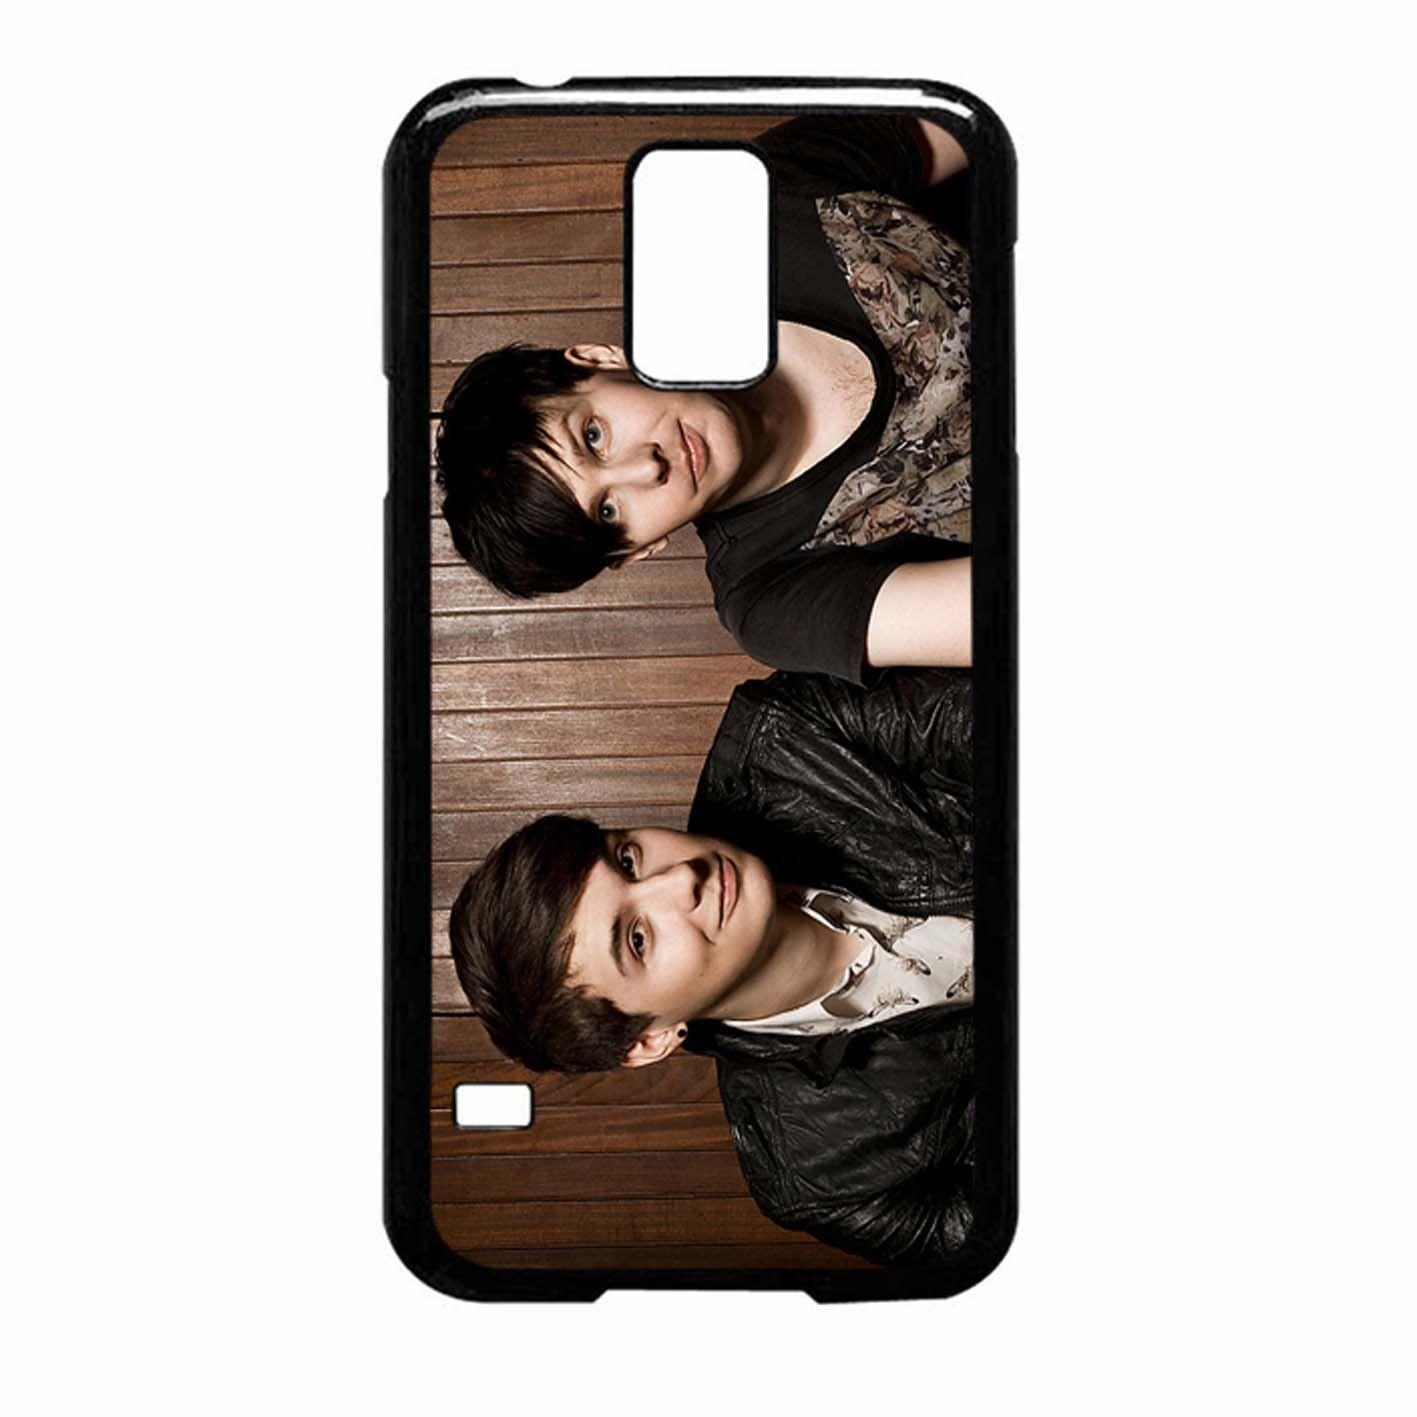 Dan And Phil 2 Samsung Galaxy S5 Case